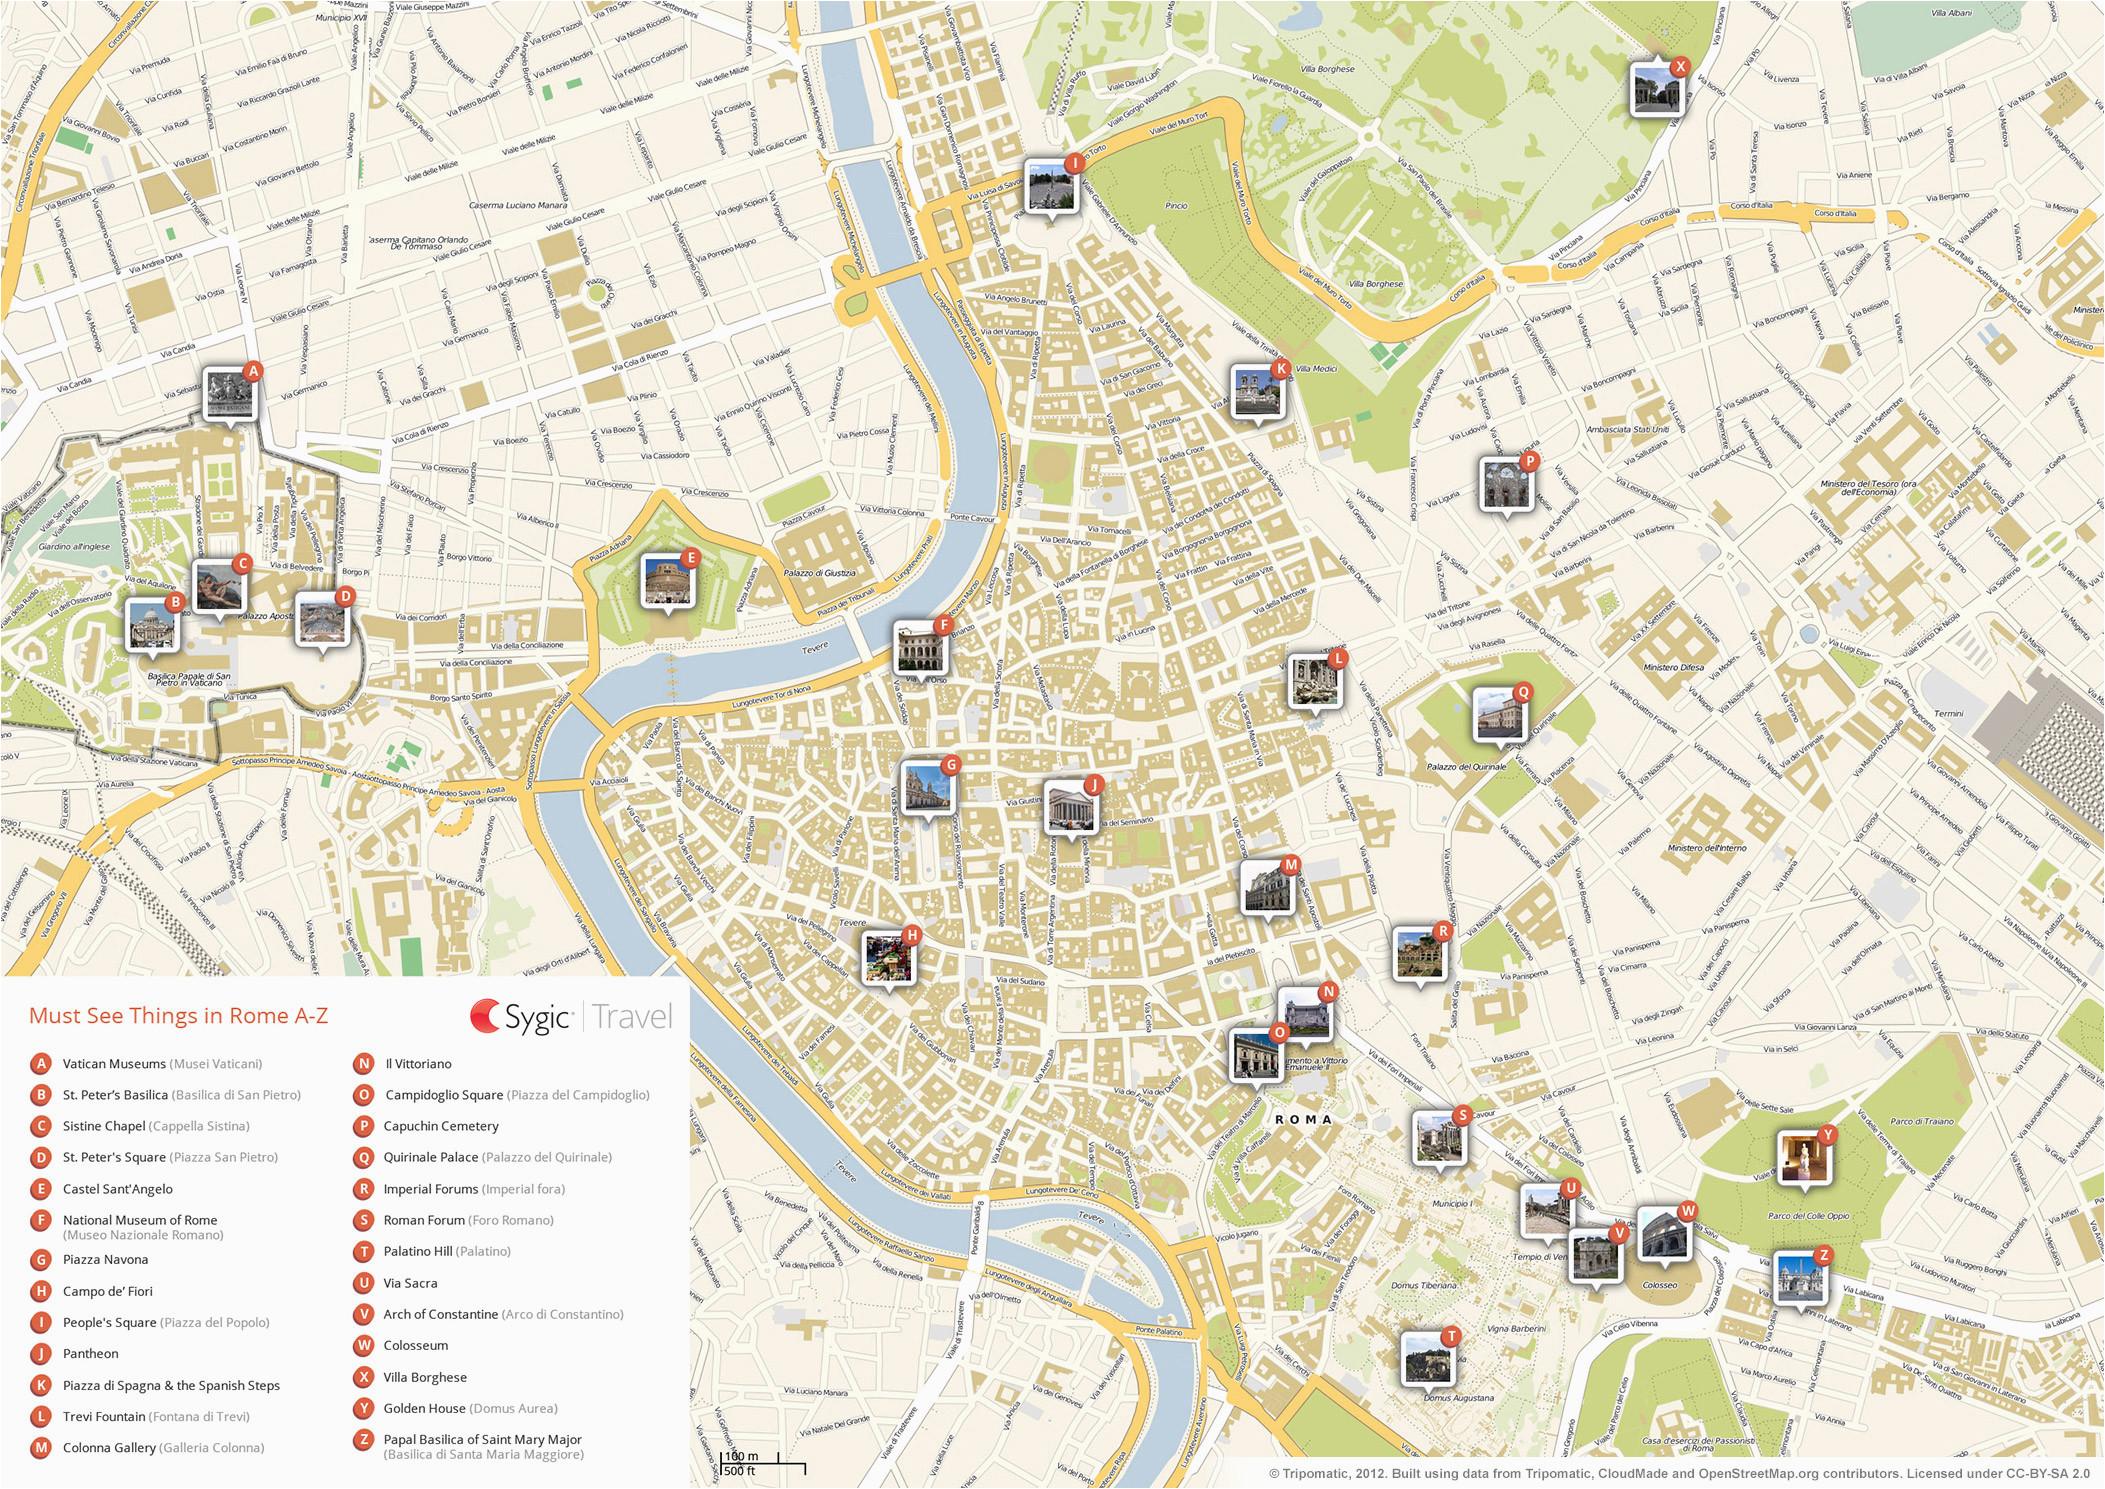 Street Map Of Rome Italy Printable Rome Printable tourist Map Sygic Travel